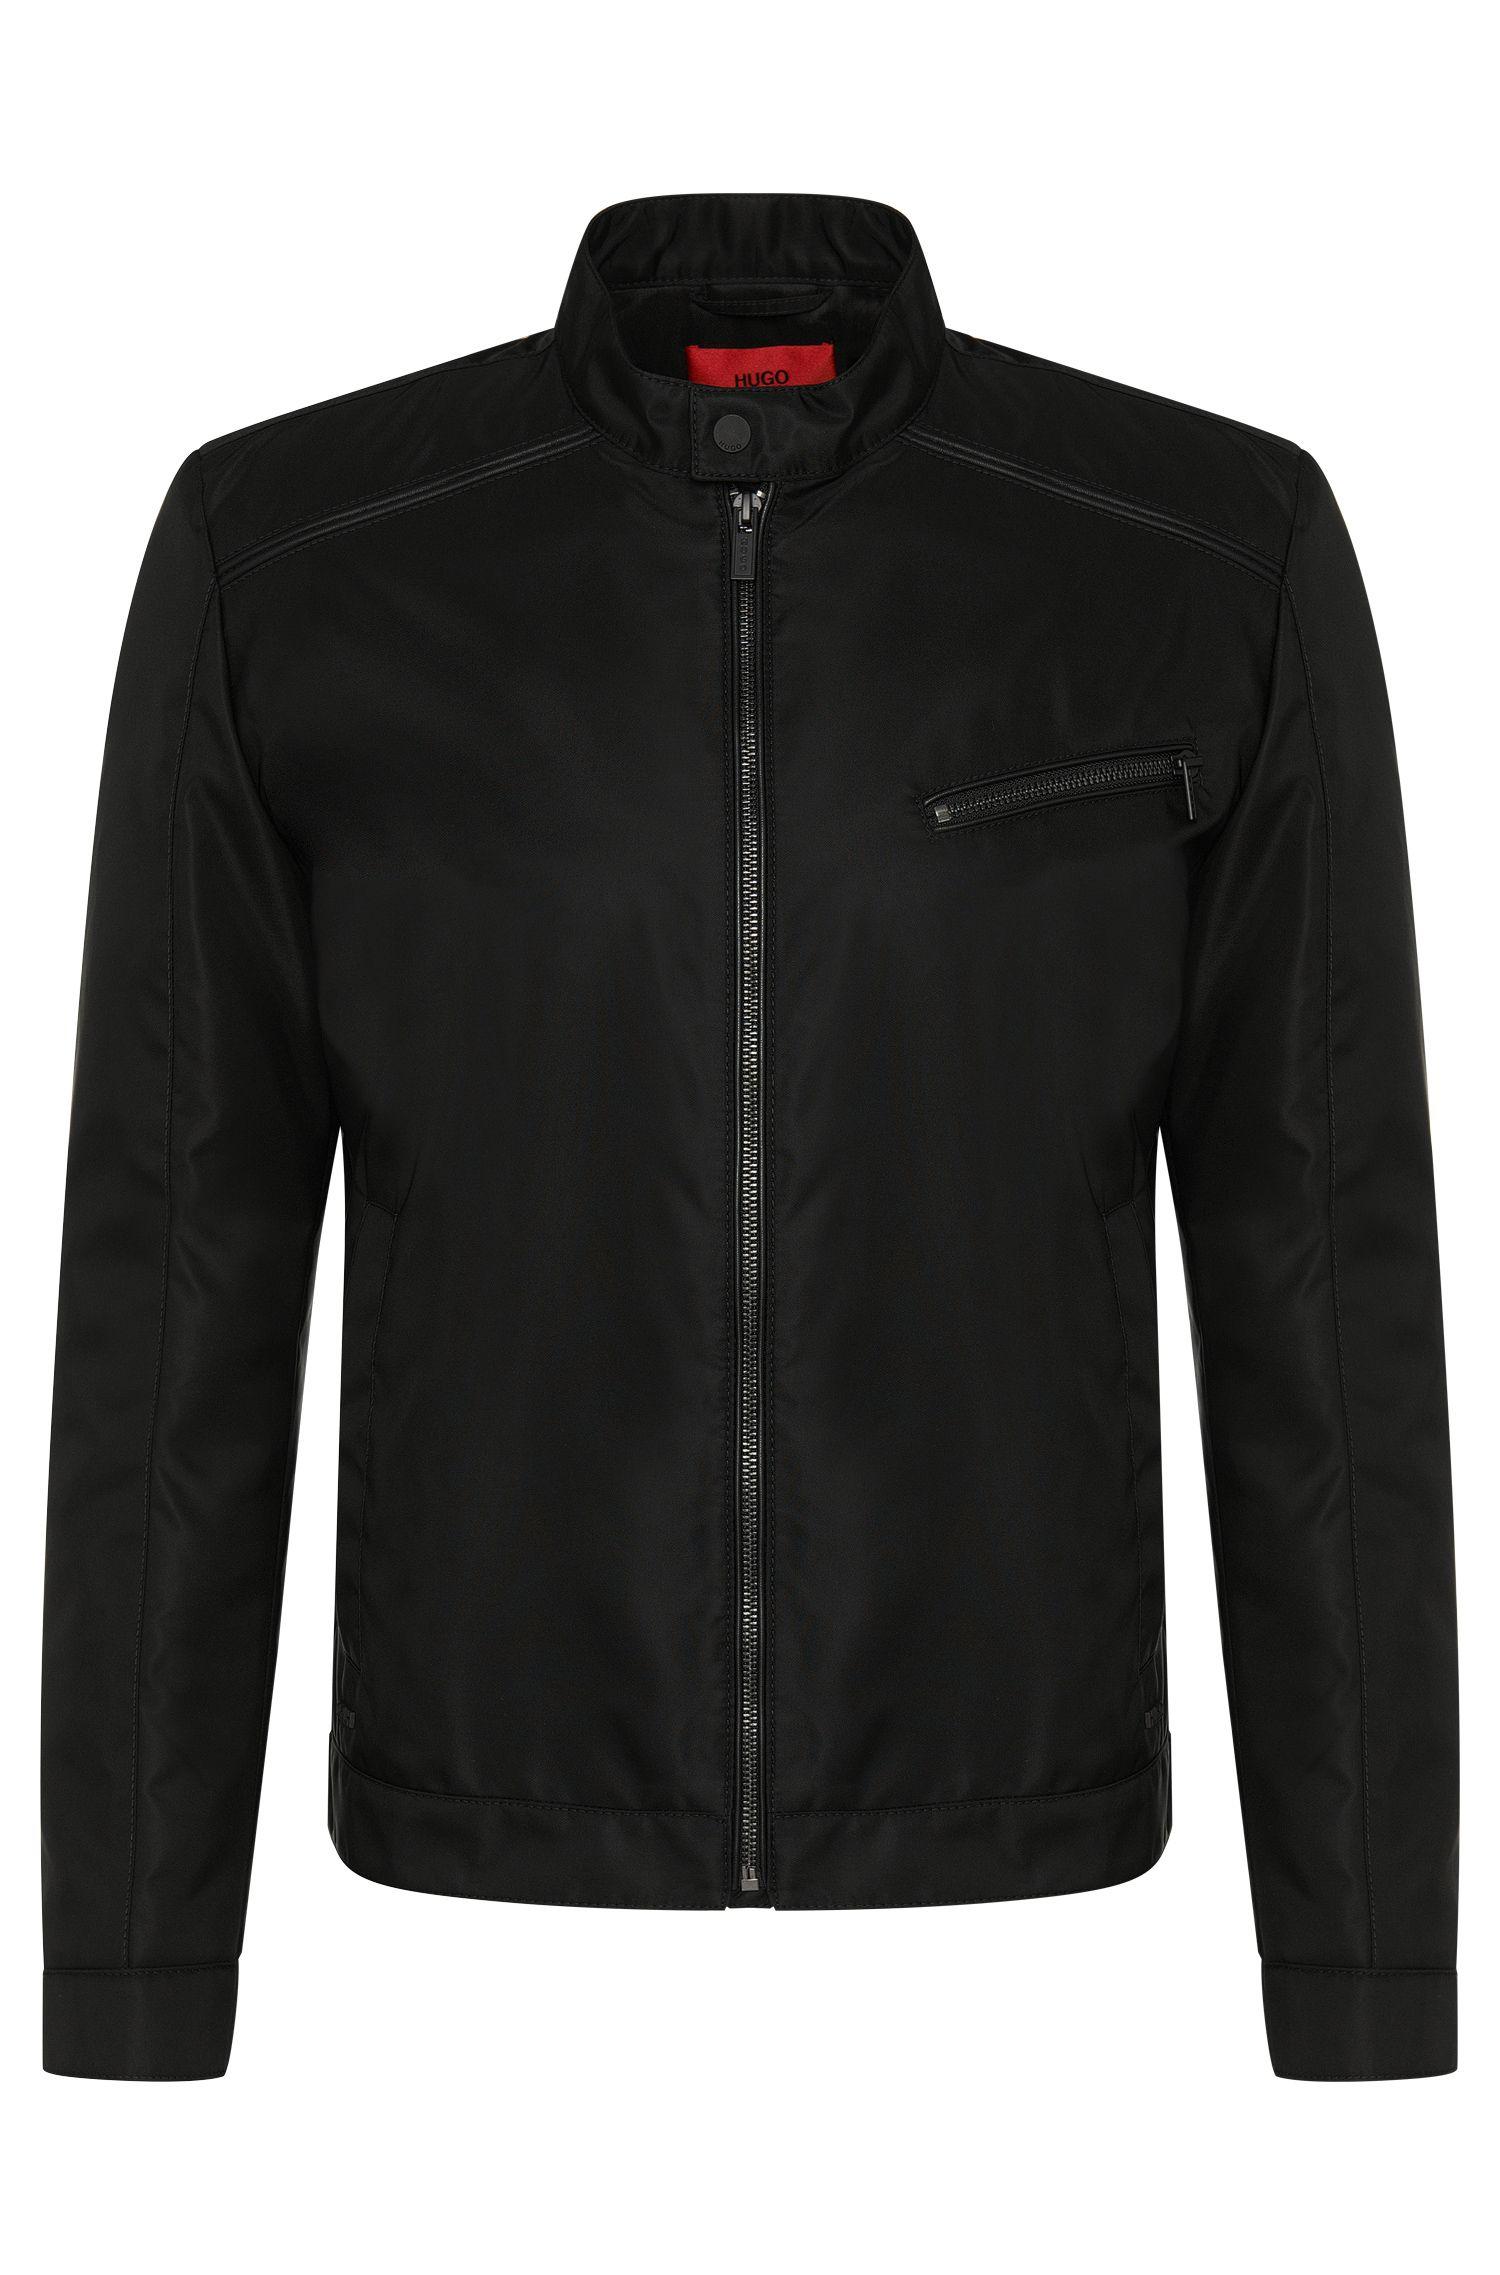 'Bandro' | Nylon Vegan-Leather Biker Jacket